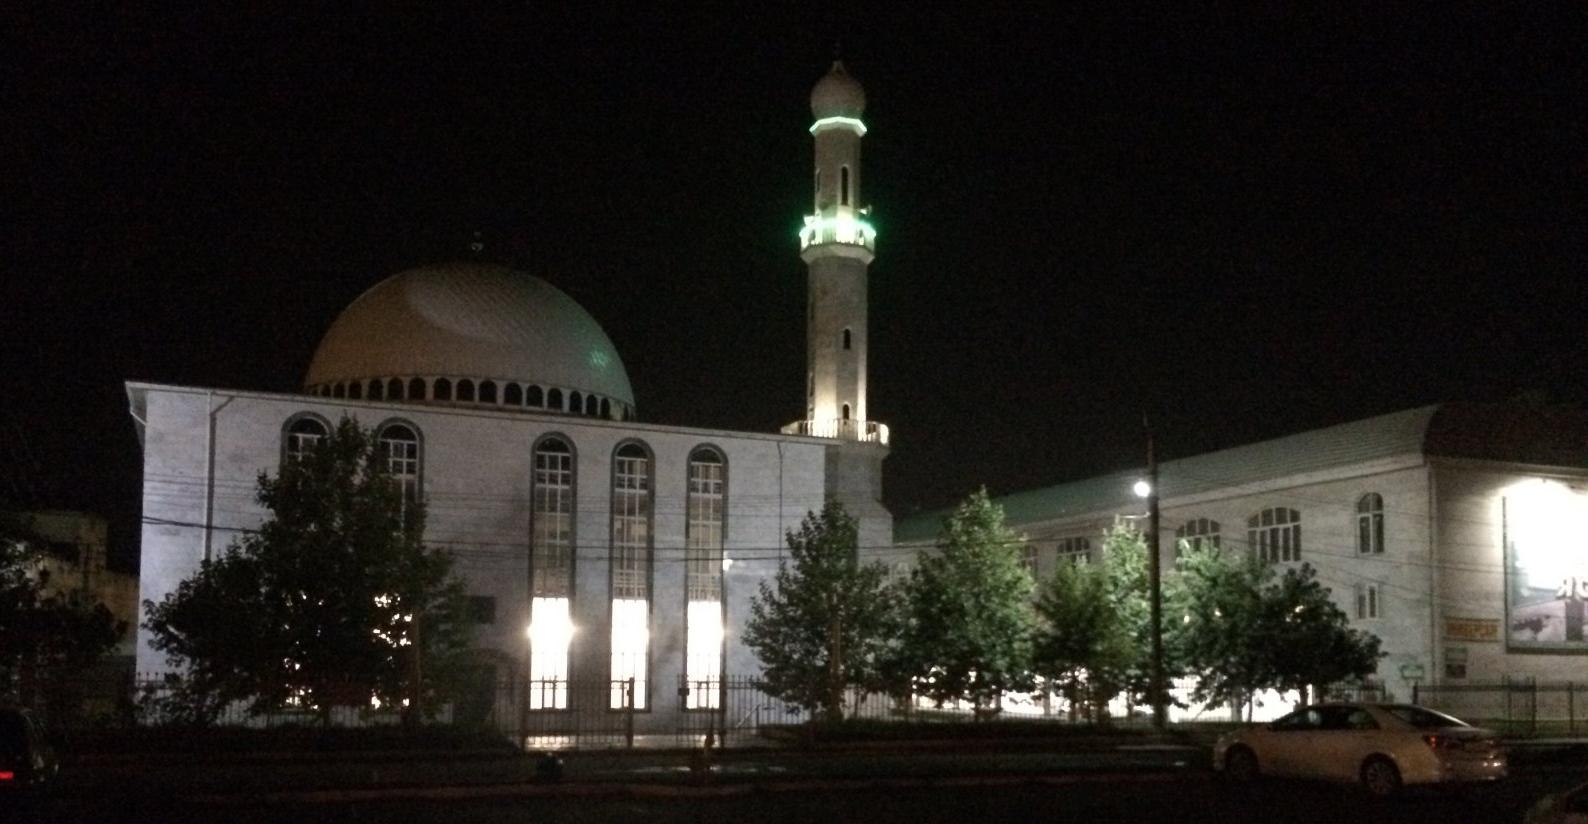 Мечеть им. Хусенил Мухаммада-афанди аль-Уриби